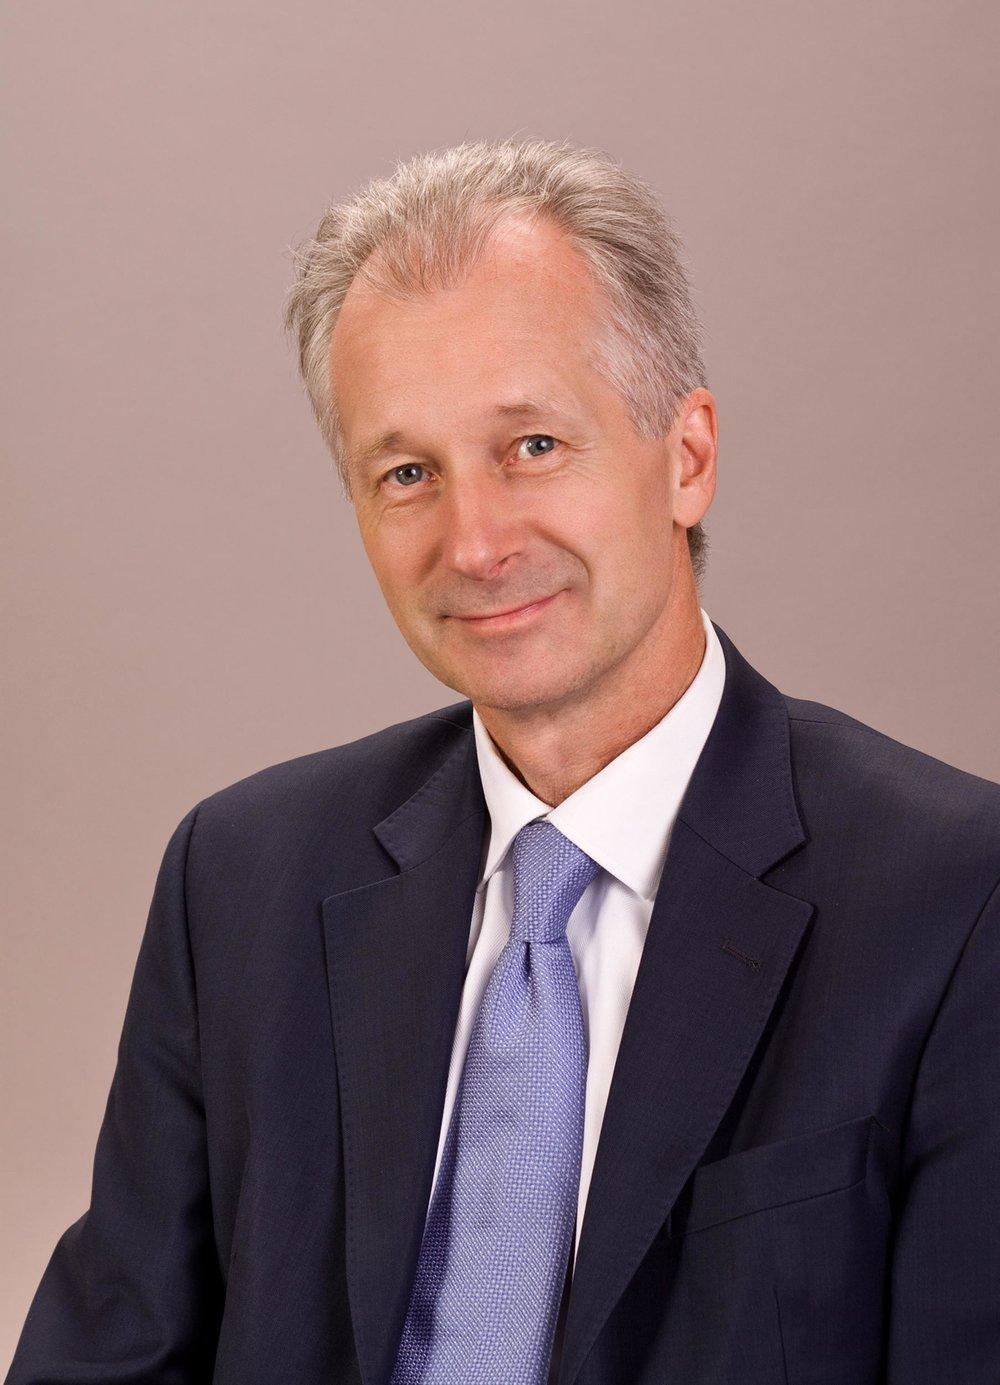 Geschäftsführer Jörg Nehls